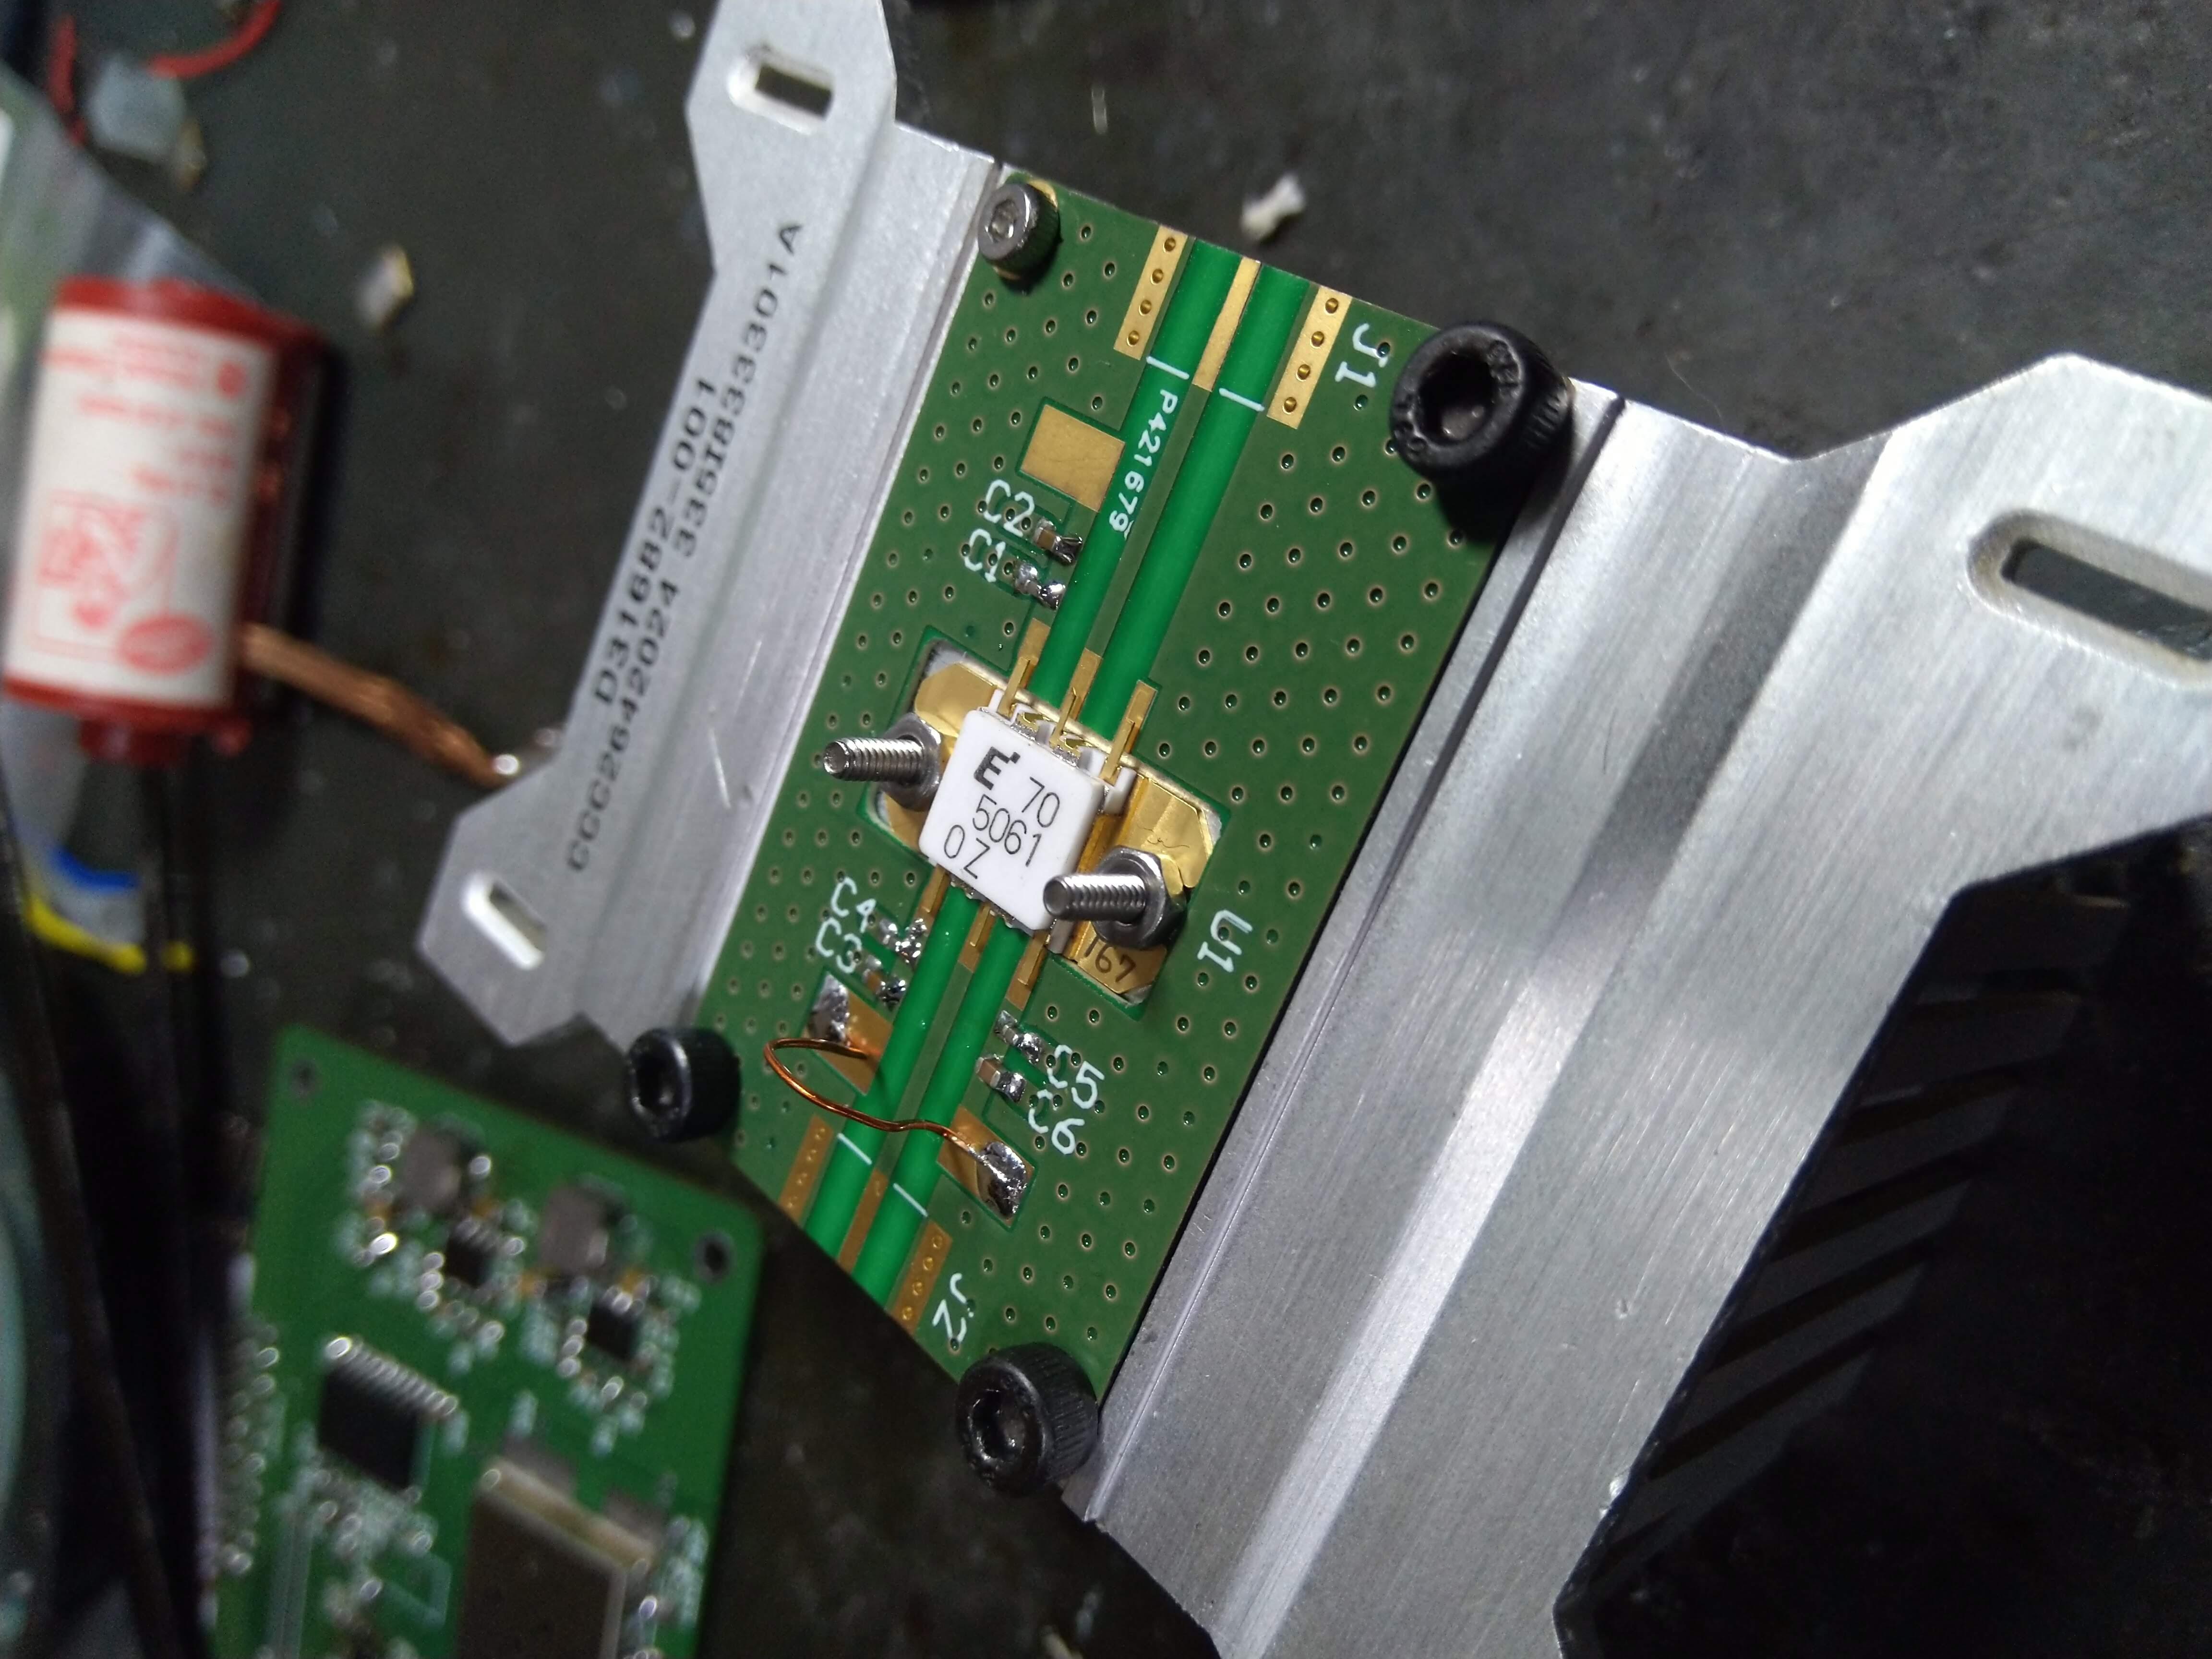 fmm5061vf pcb process